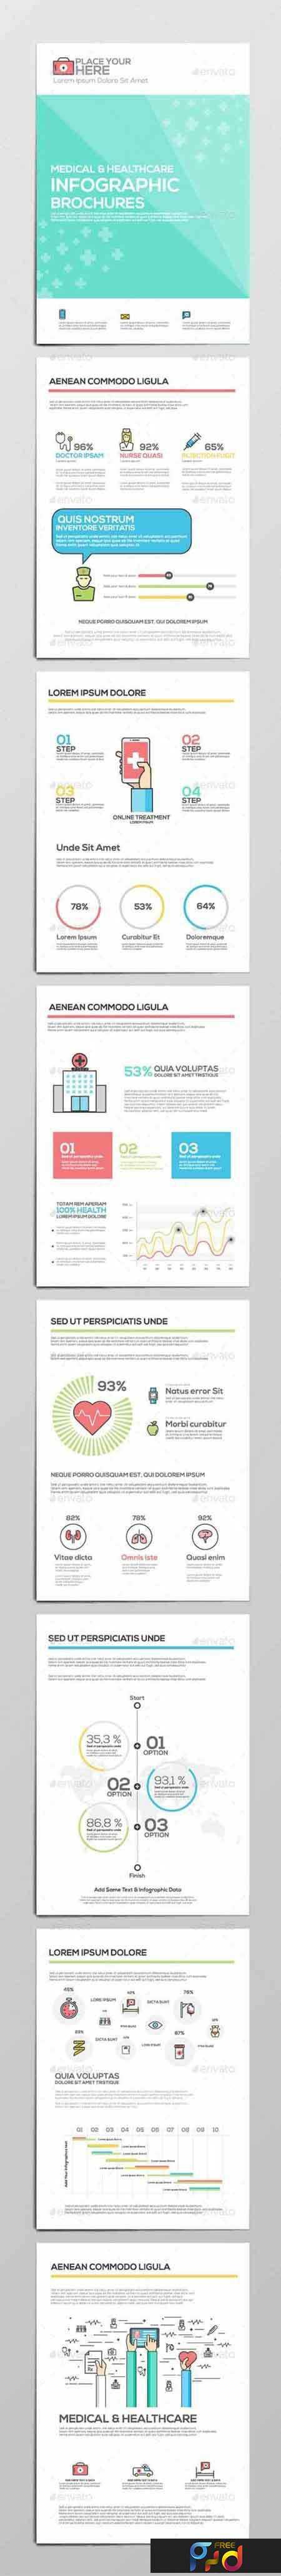 freepsdvn-com_1480072103_medical-and-healthcare-infographics-13079616